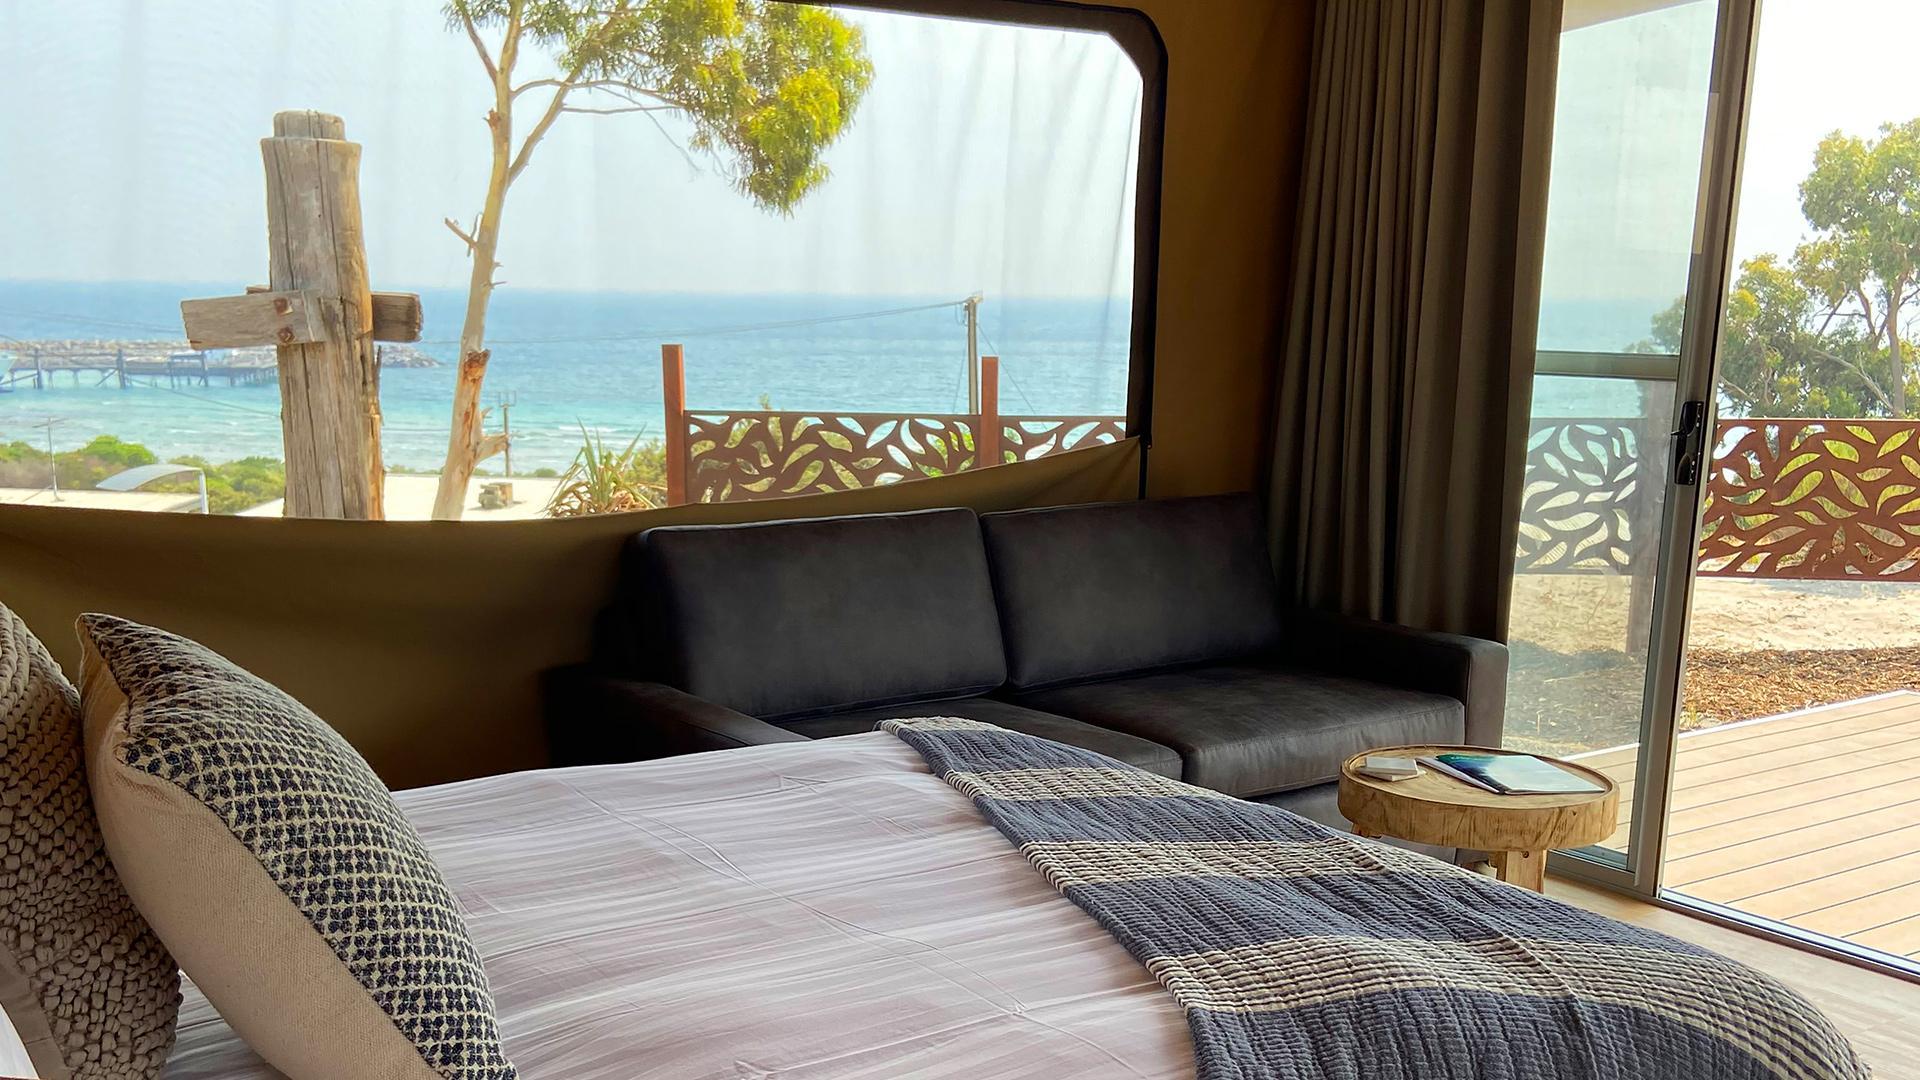 Eco Luxury Tent image 1 at Seafront Kangaroo Island by Kangaroo Island Council, South Australia, Australia